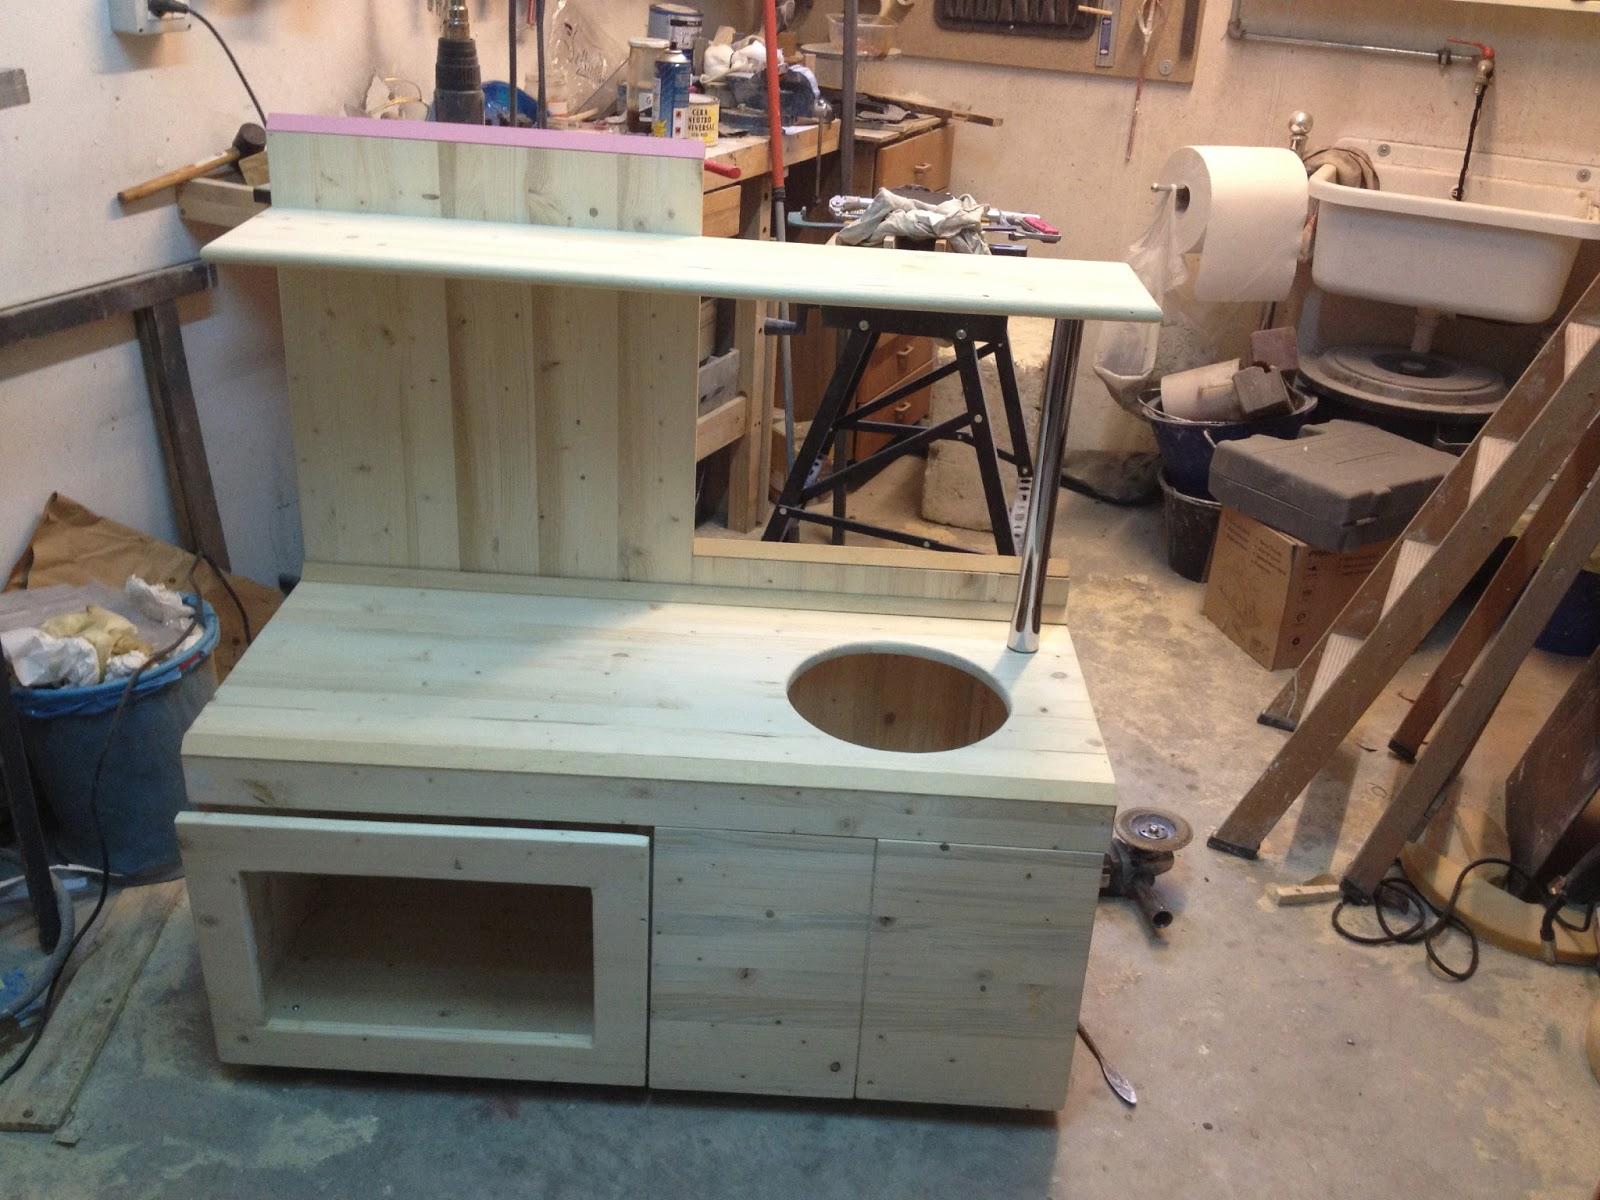 Mammarum come costruire una cucina per bambini di legno - Mobili x cucina ...